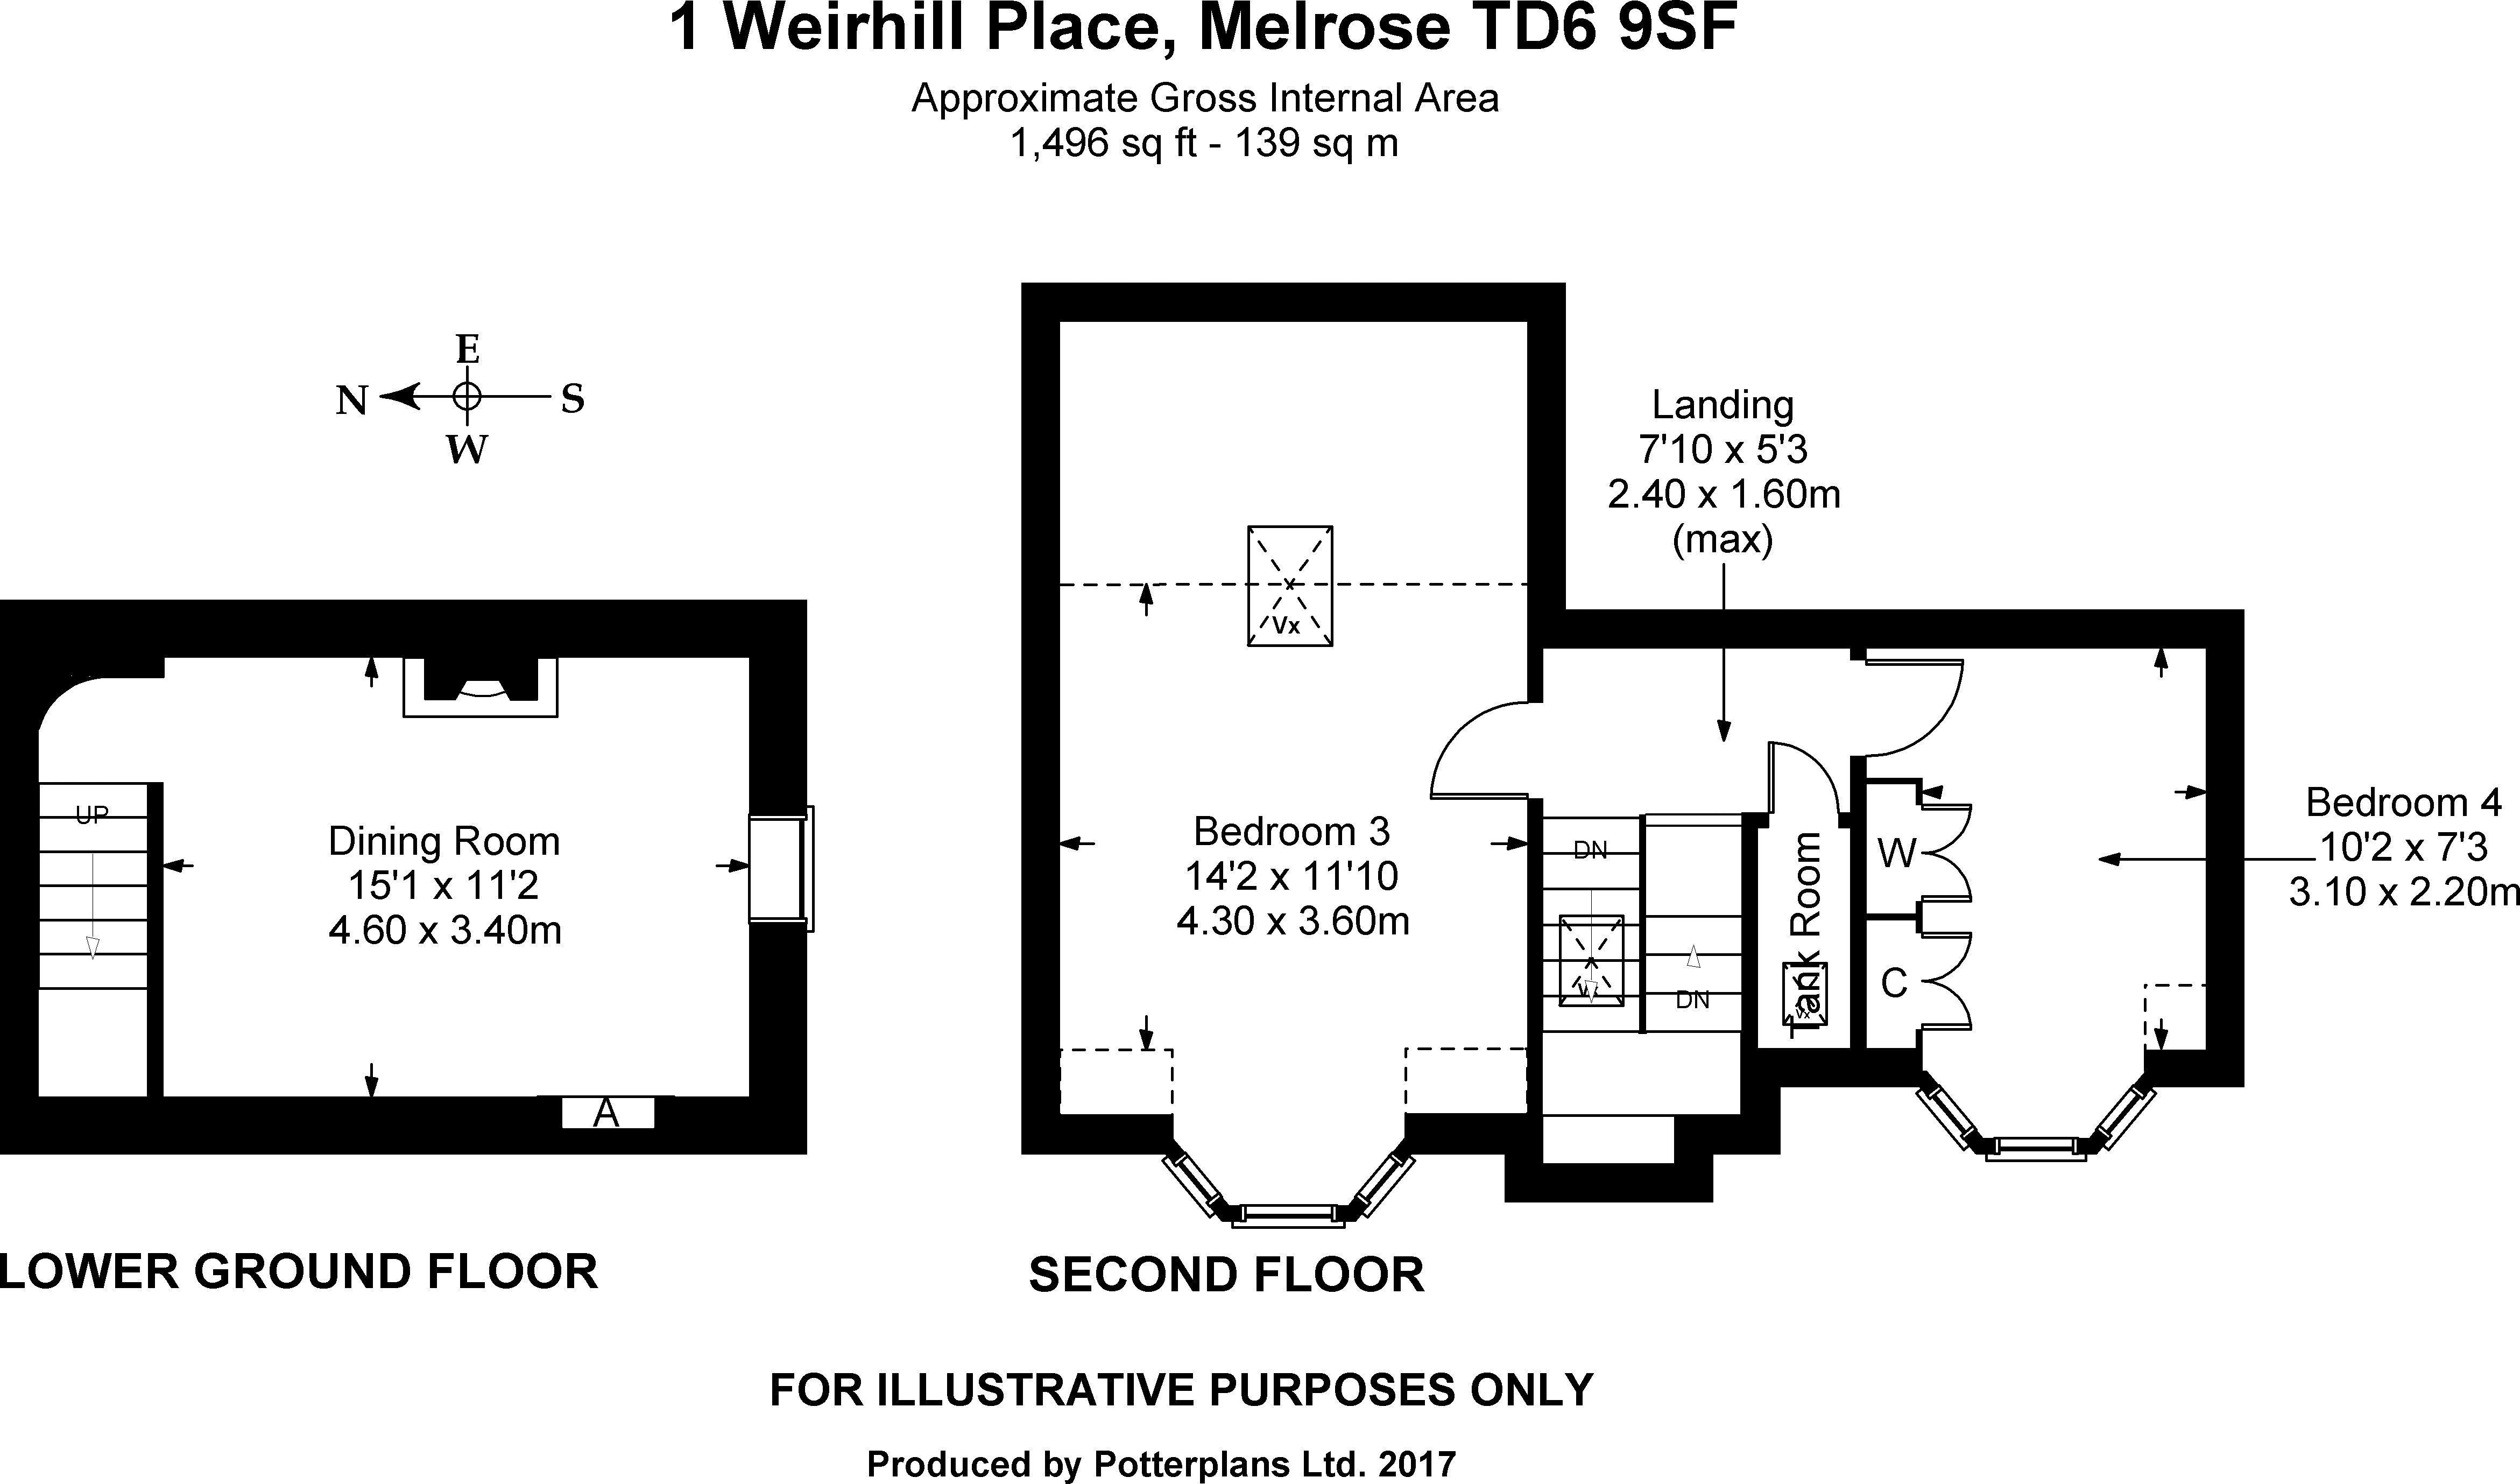 1 Weirhill Place 2nd Floor & Lower Ground Floor